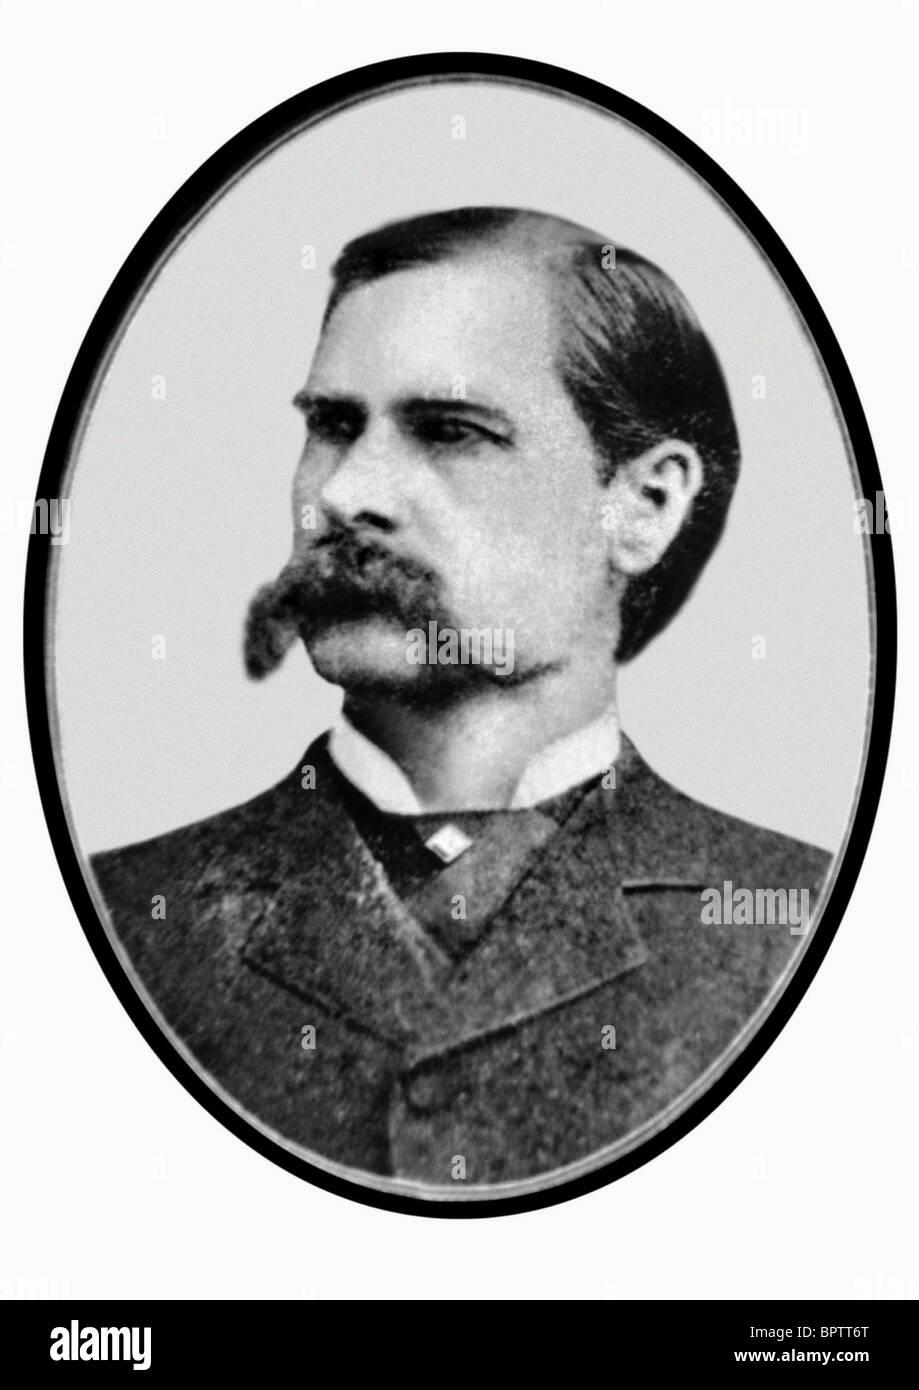 WYATT EARP US MARSHALL (1900) - Stock Image